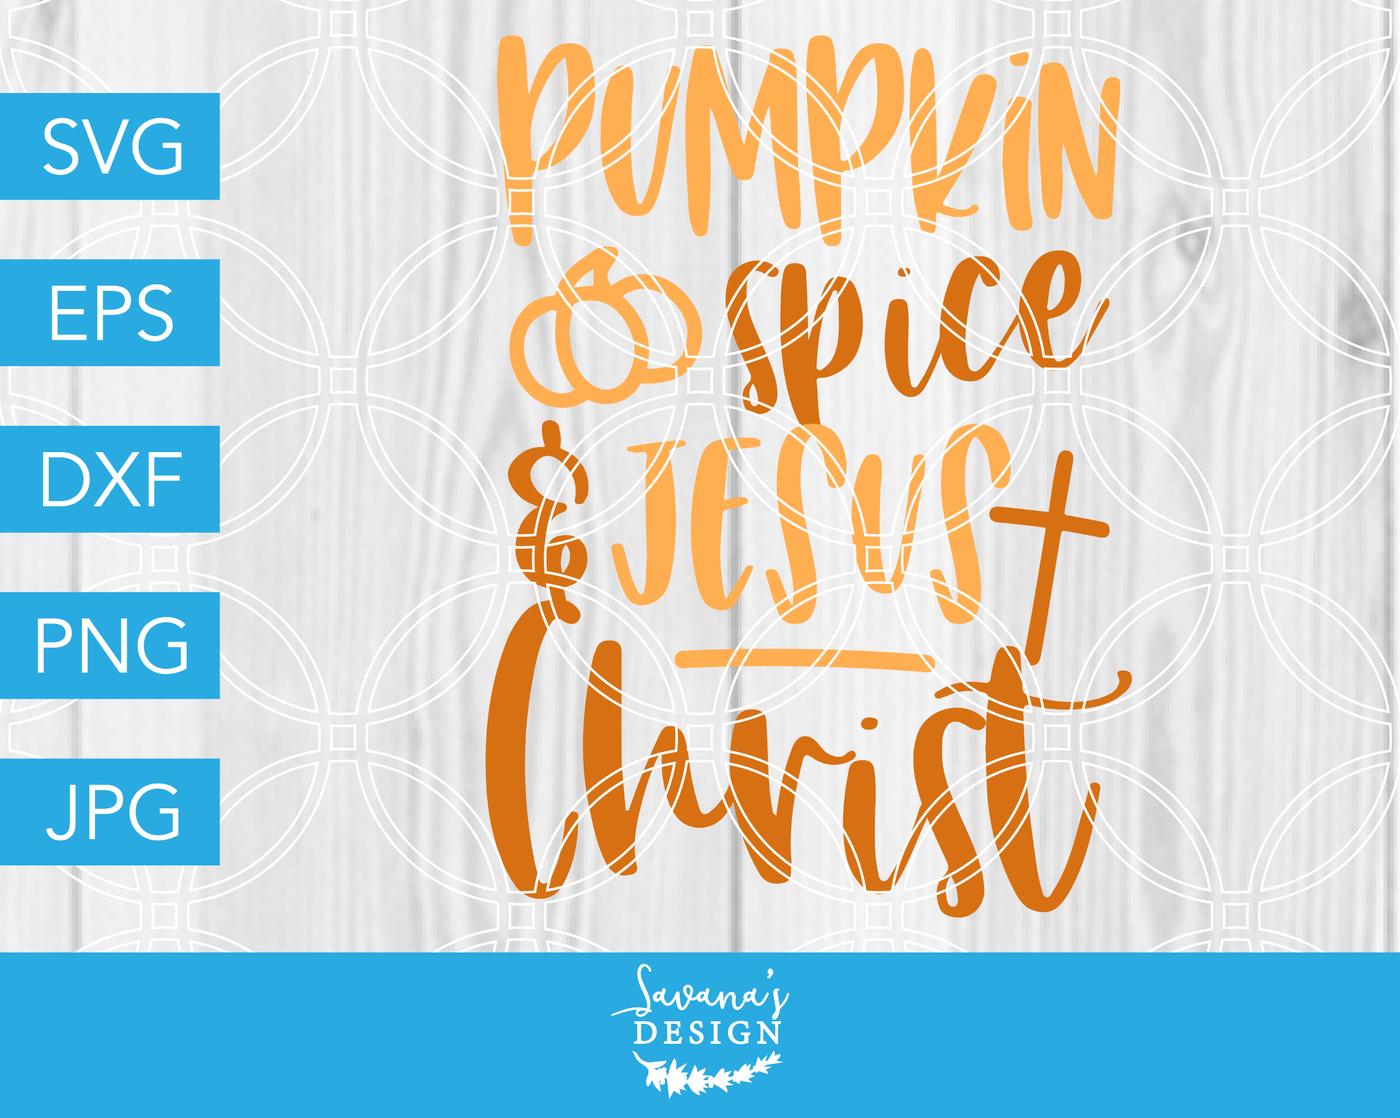 Pumpkin Spice And Jesus Christ Svg Dxf Eps Jpg Cut File Cricut By Savanasdesign Thehungryjpeg Com